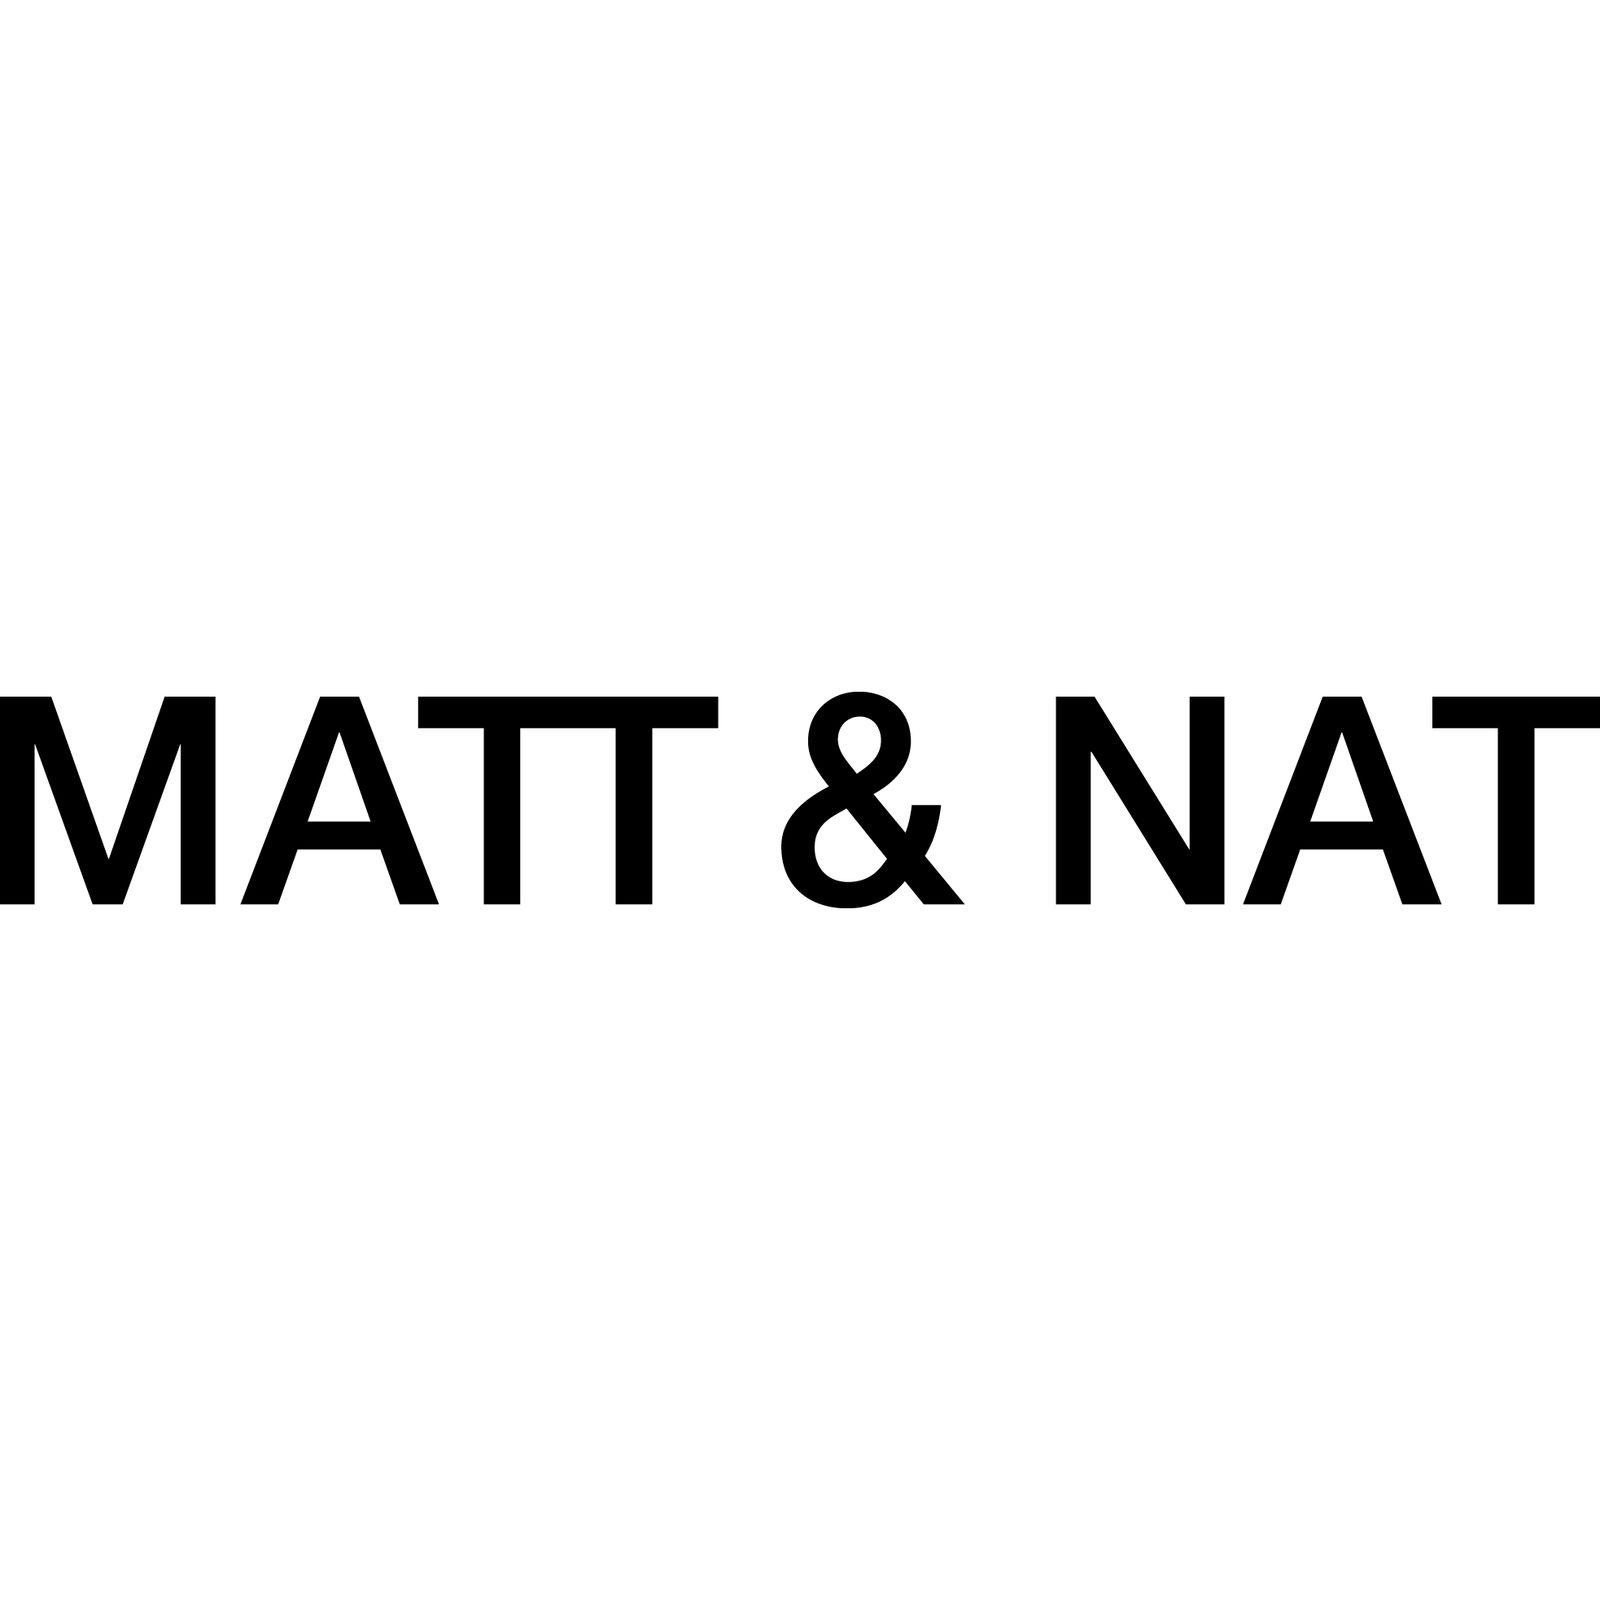 MATT & NAT (Bild 1)